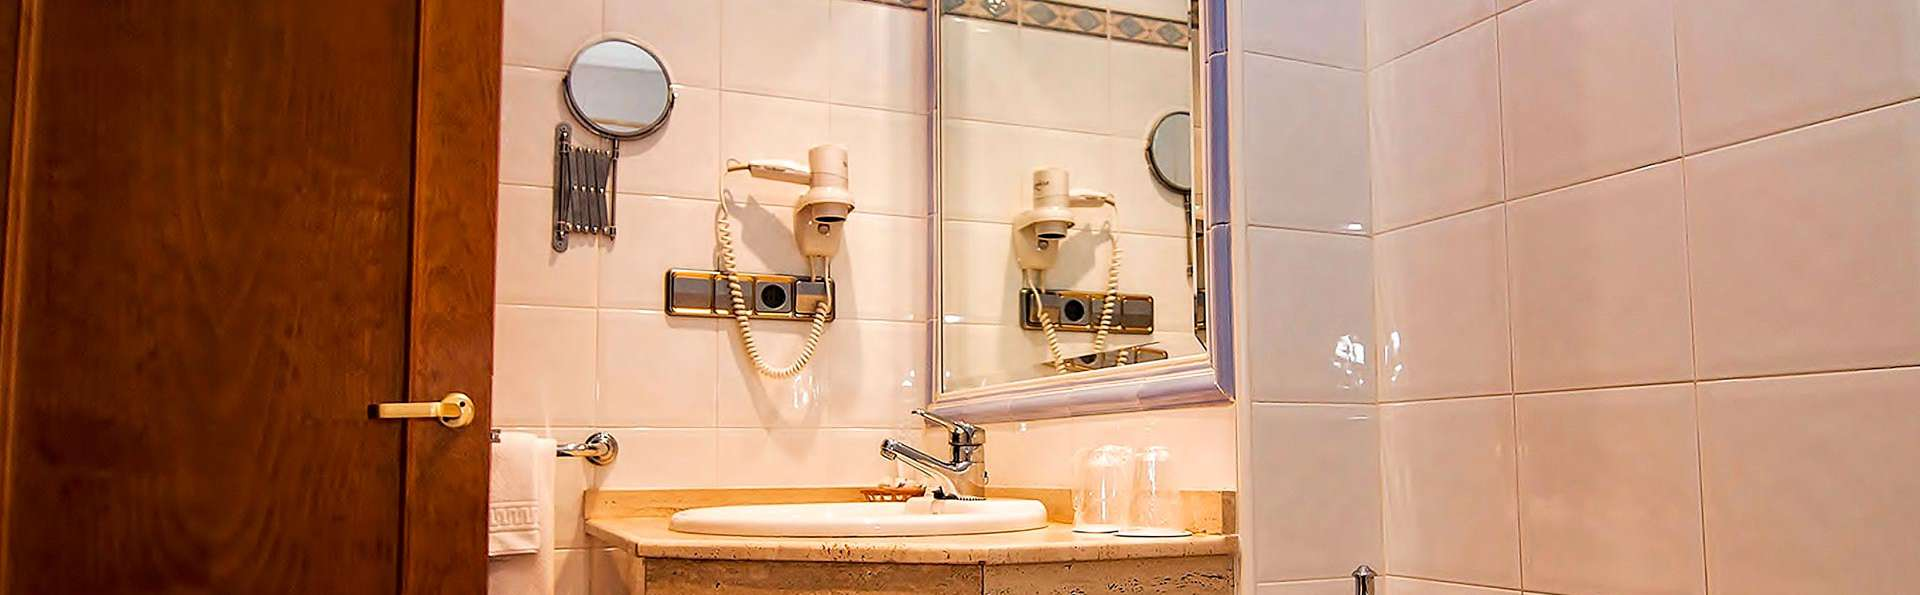 Hotel Jalance Experience - EDIT_DOUBLE_04.jpg